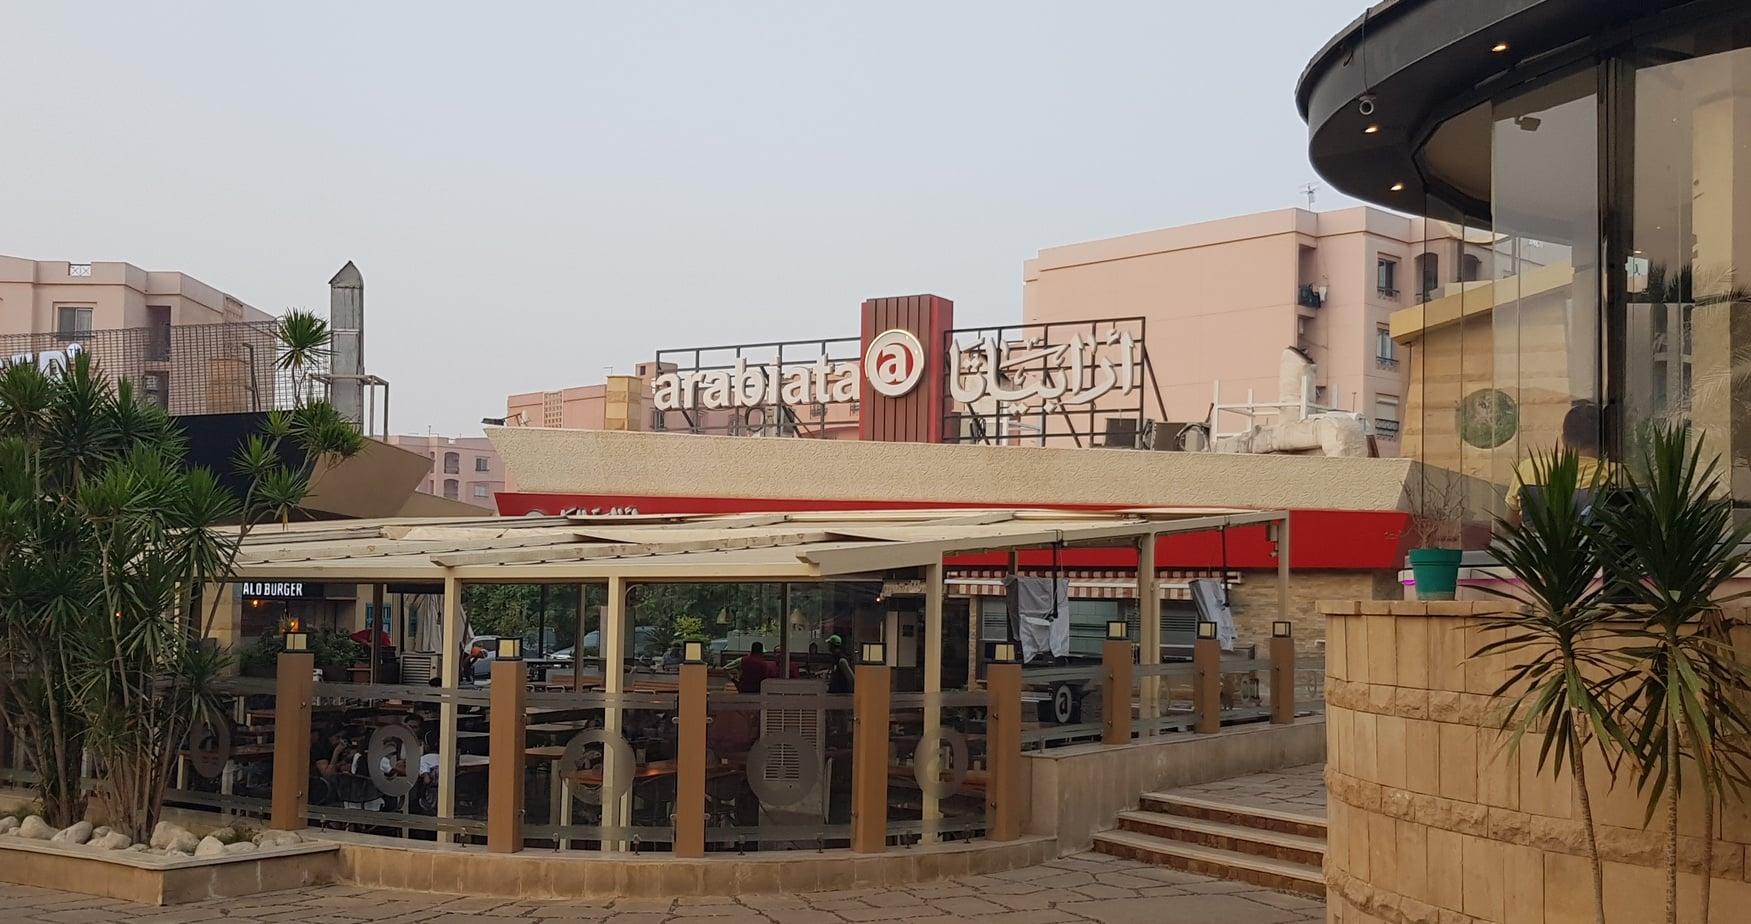 Arabiata - El Shabrawy - Rehab City - New Cairo - Egypt